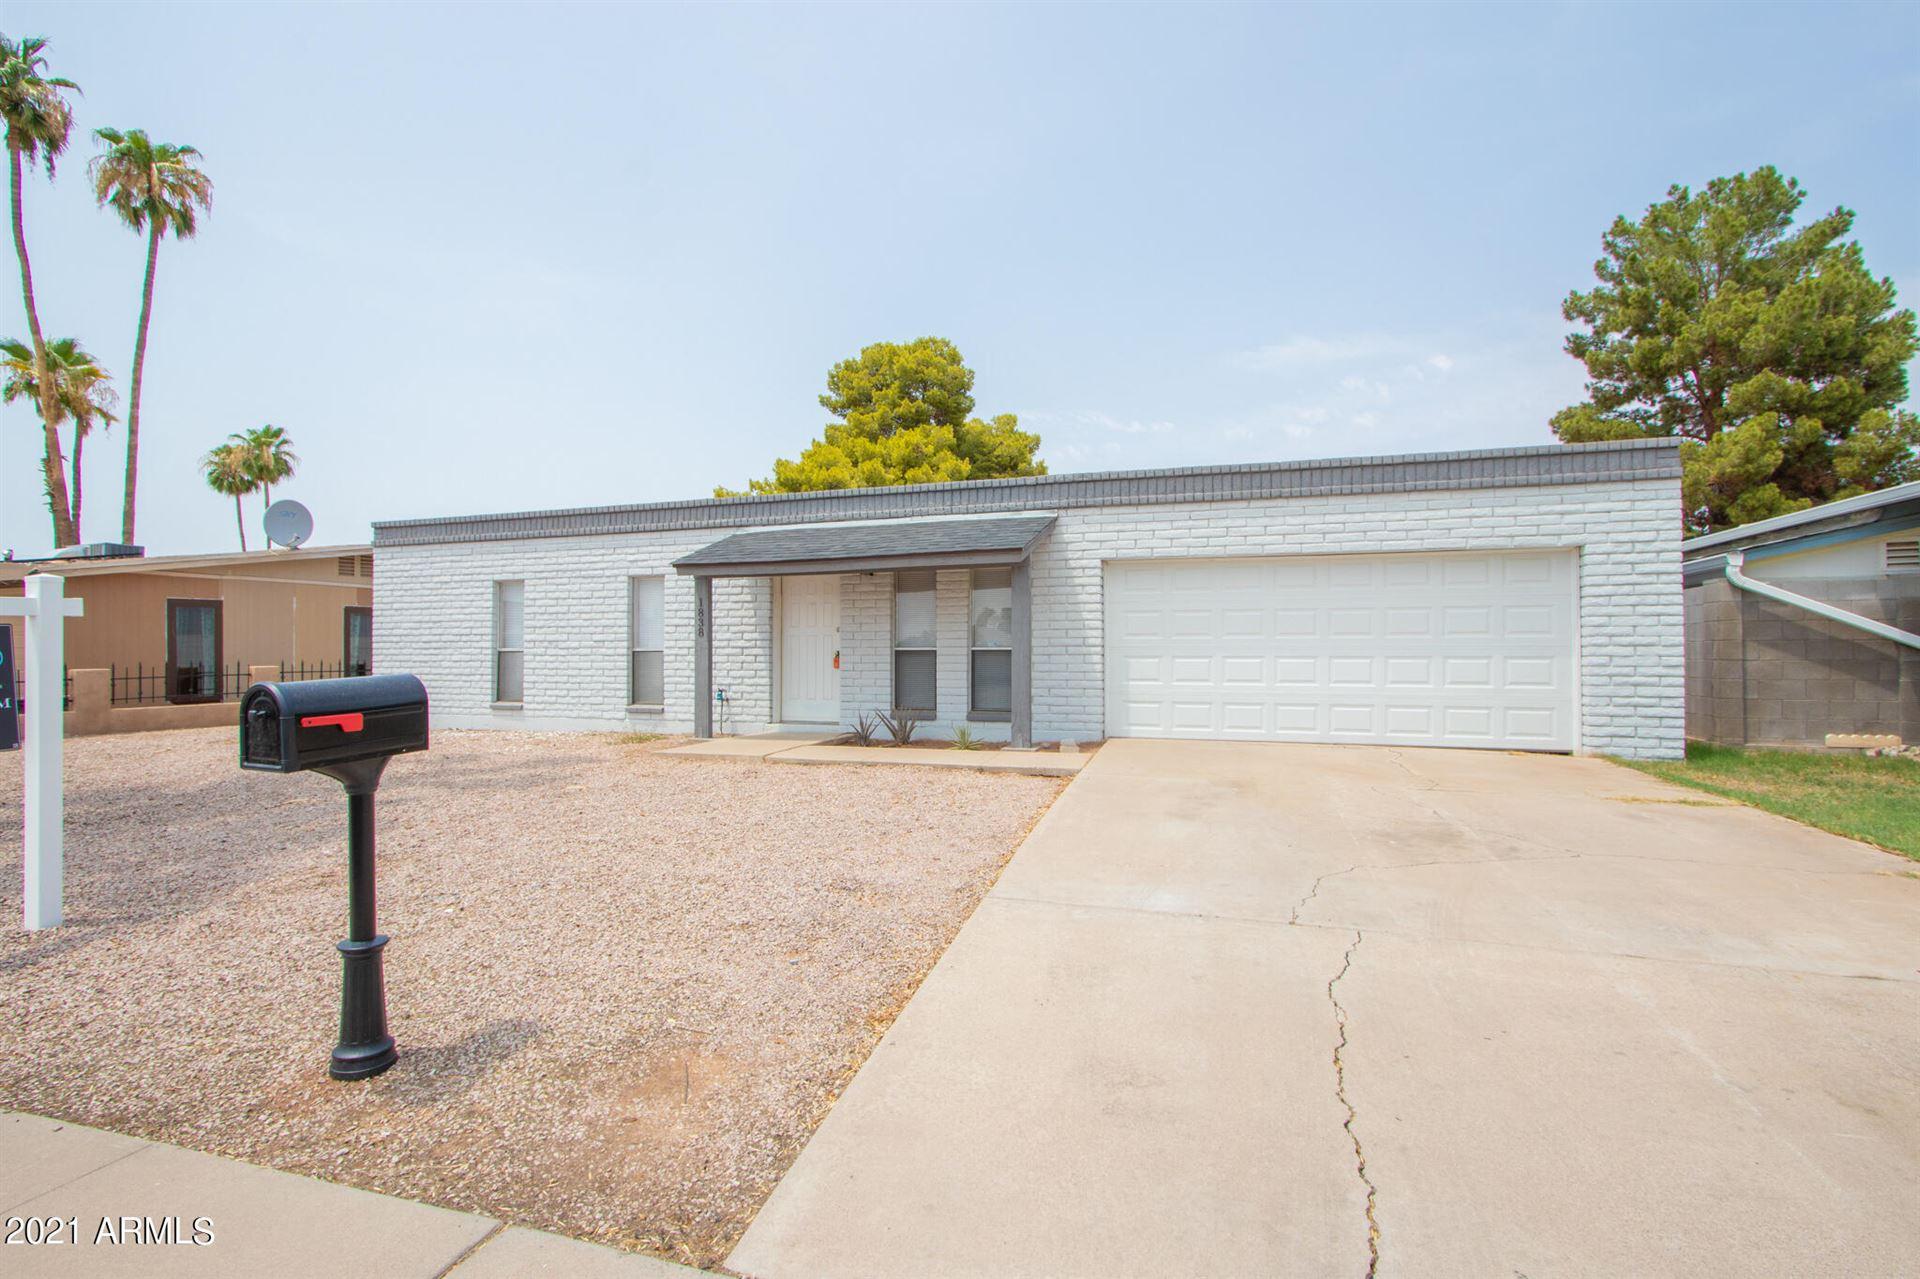 Photo of 1838 E ENID Avenue, Mesa, AZ 85204 (MLS # 6269408)